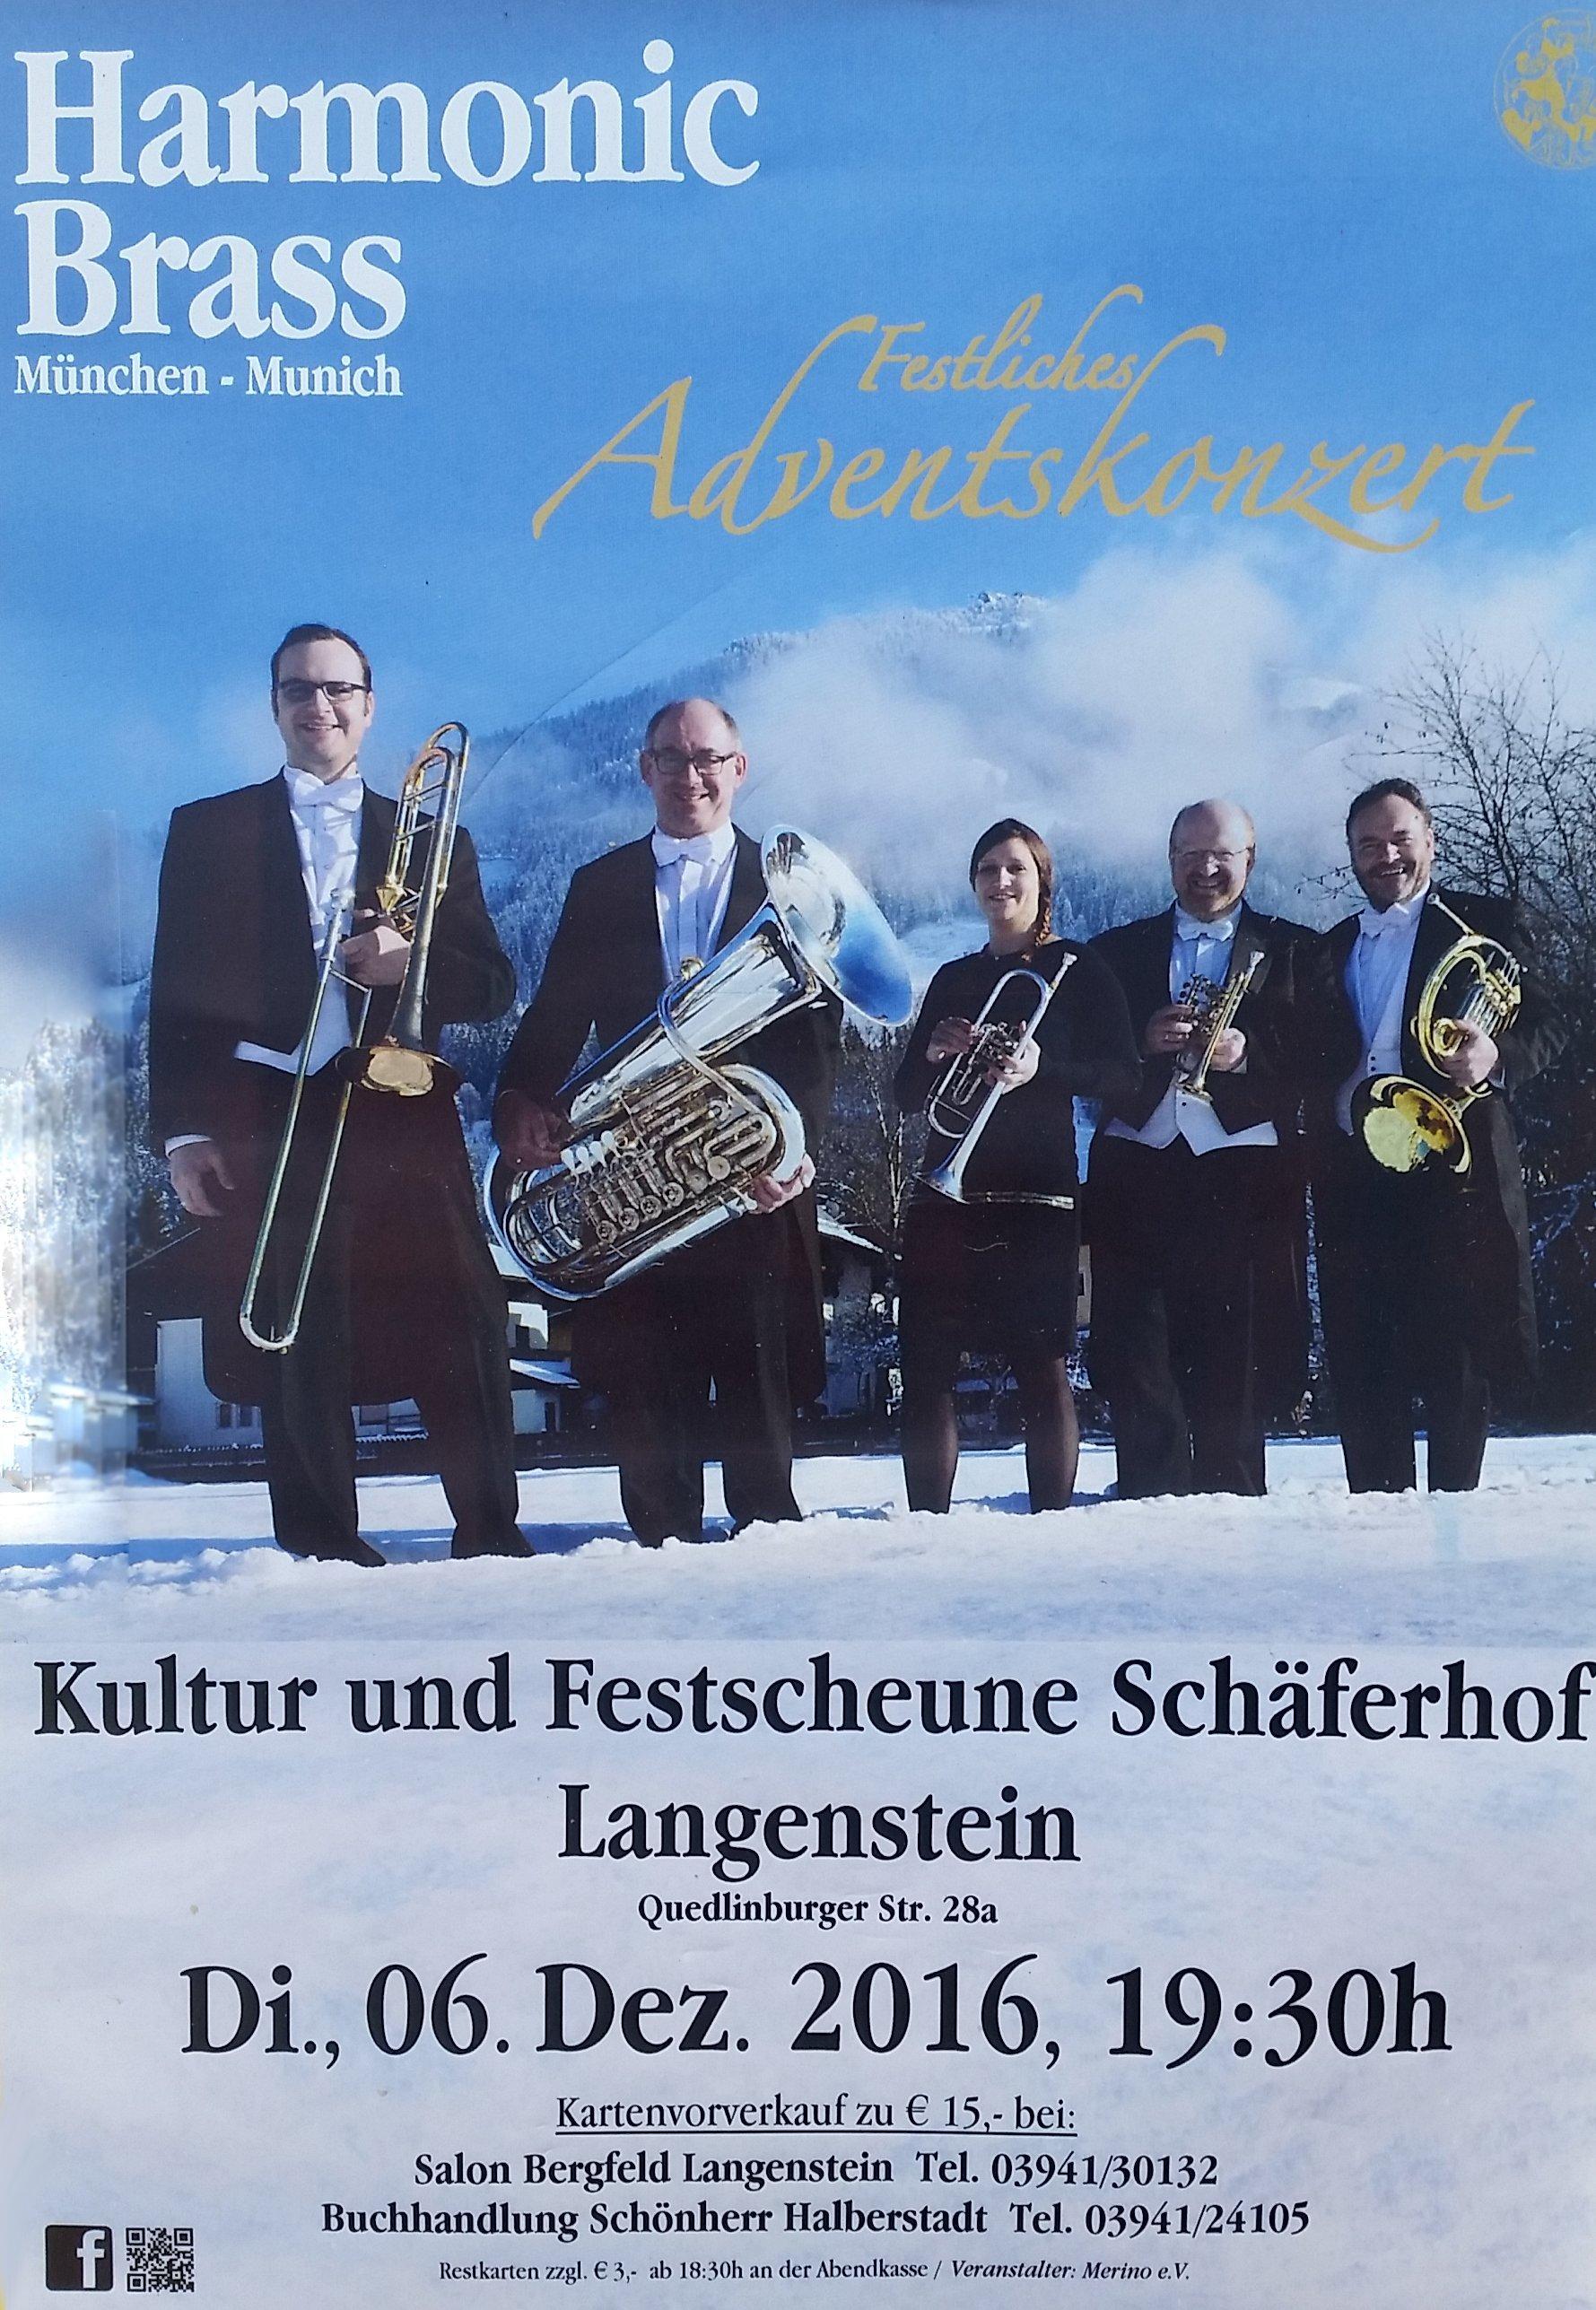 Plakat Harmonic Brass